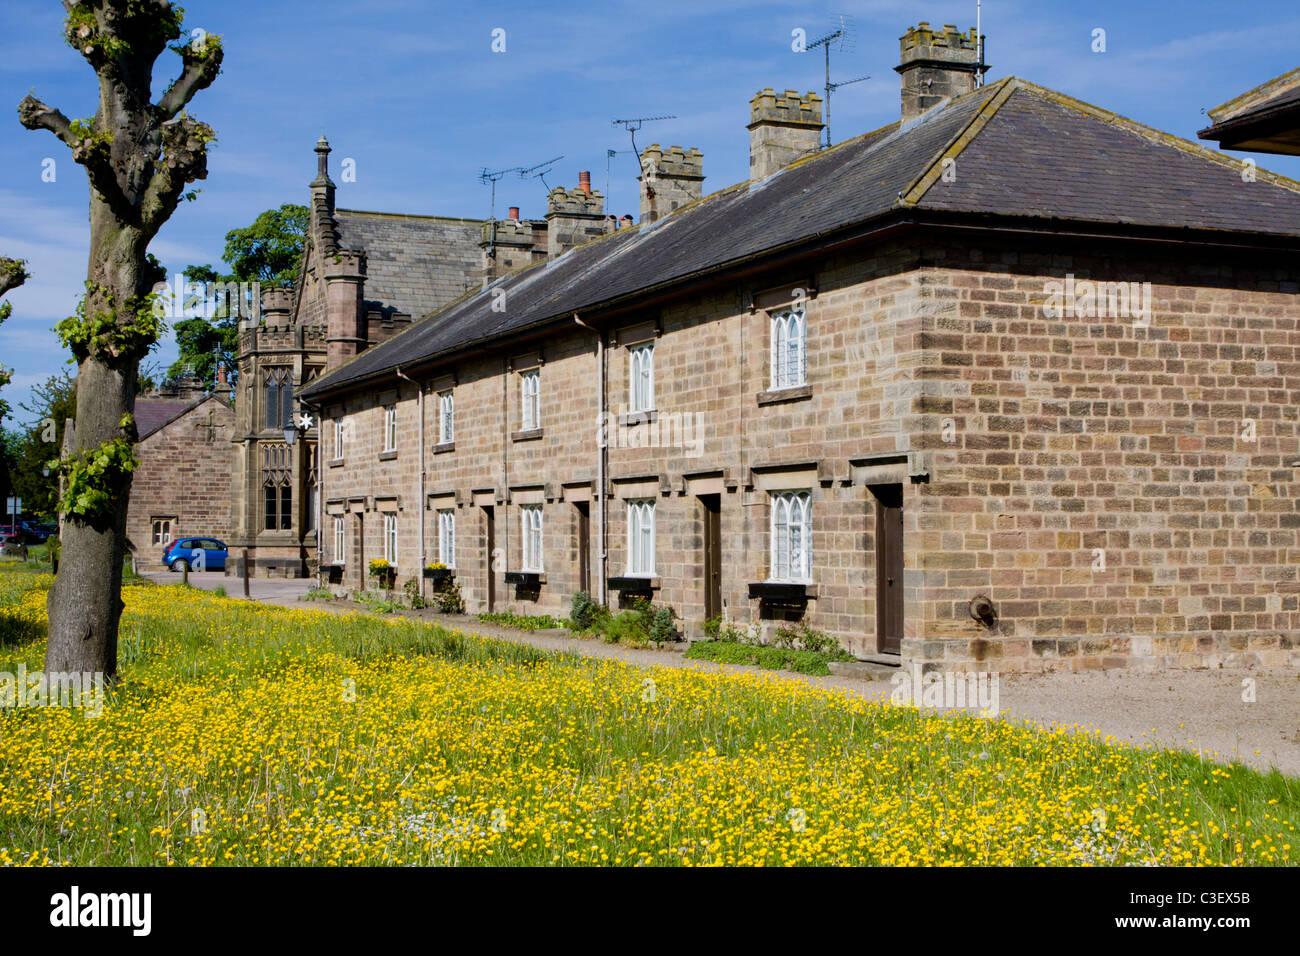 Ripley Village North Yorkshire UK Photo Stock